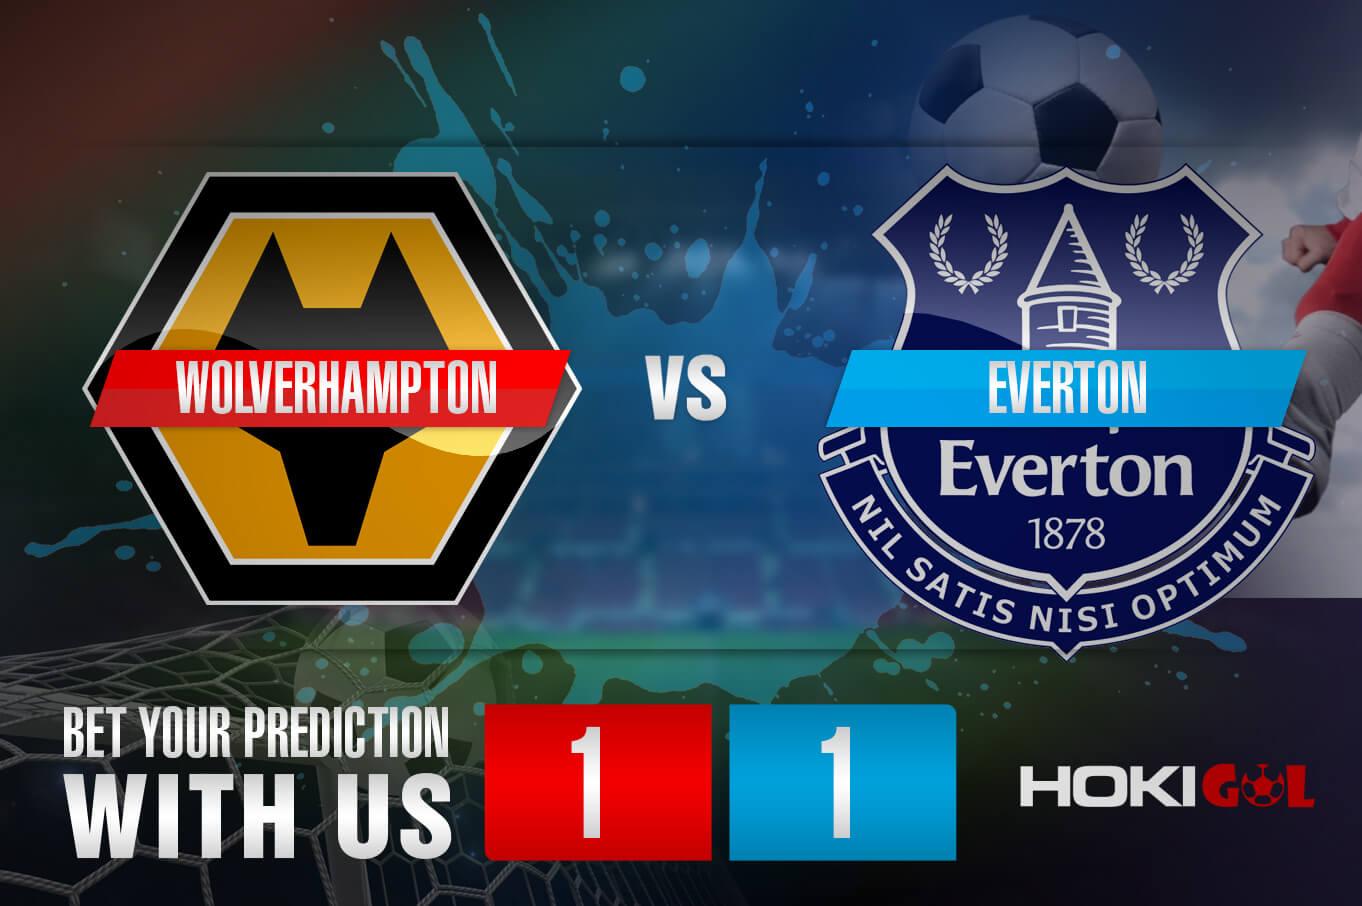 Prediksi Bola Wolverhampton Vs Everton 13 Januari 2021